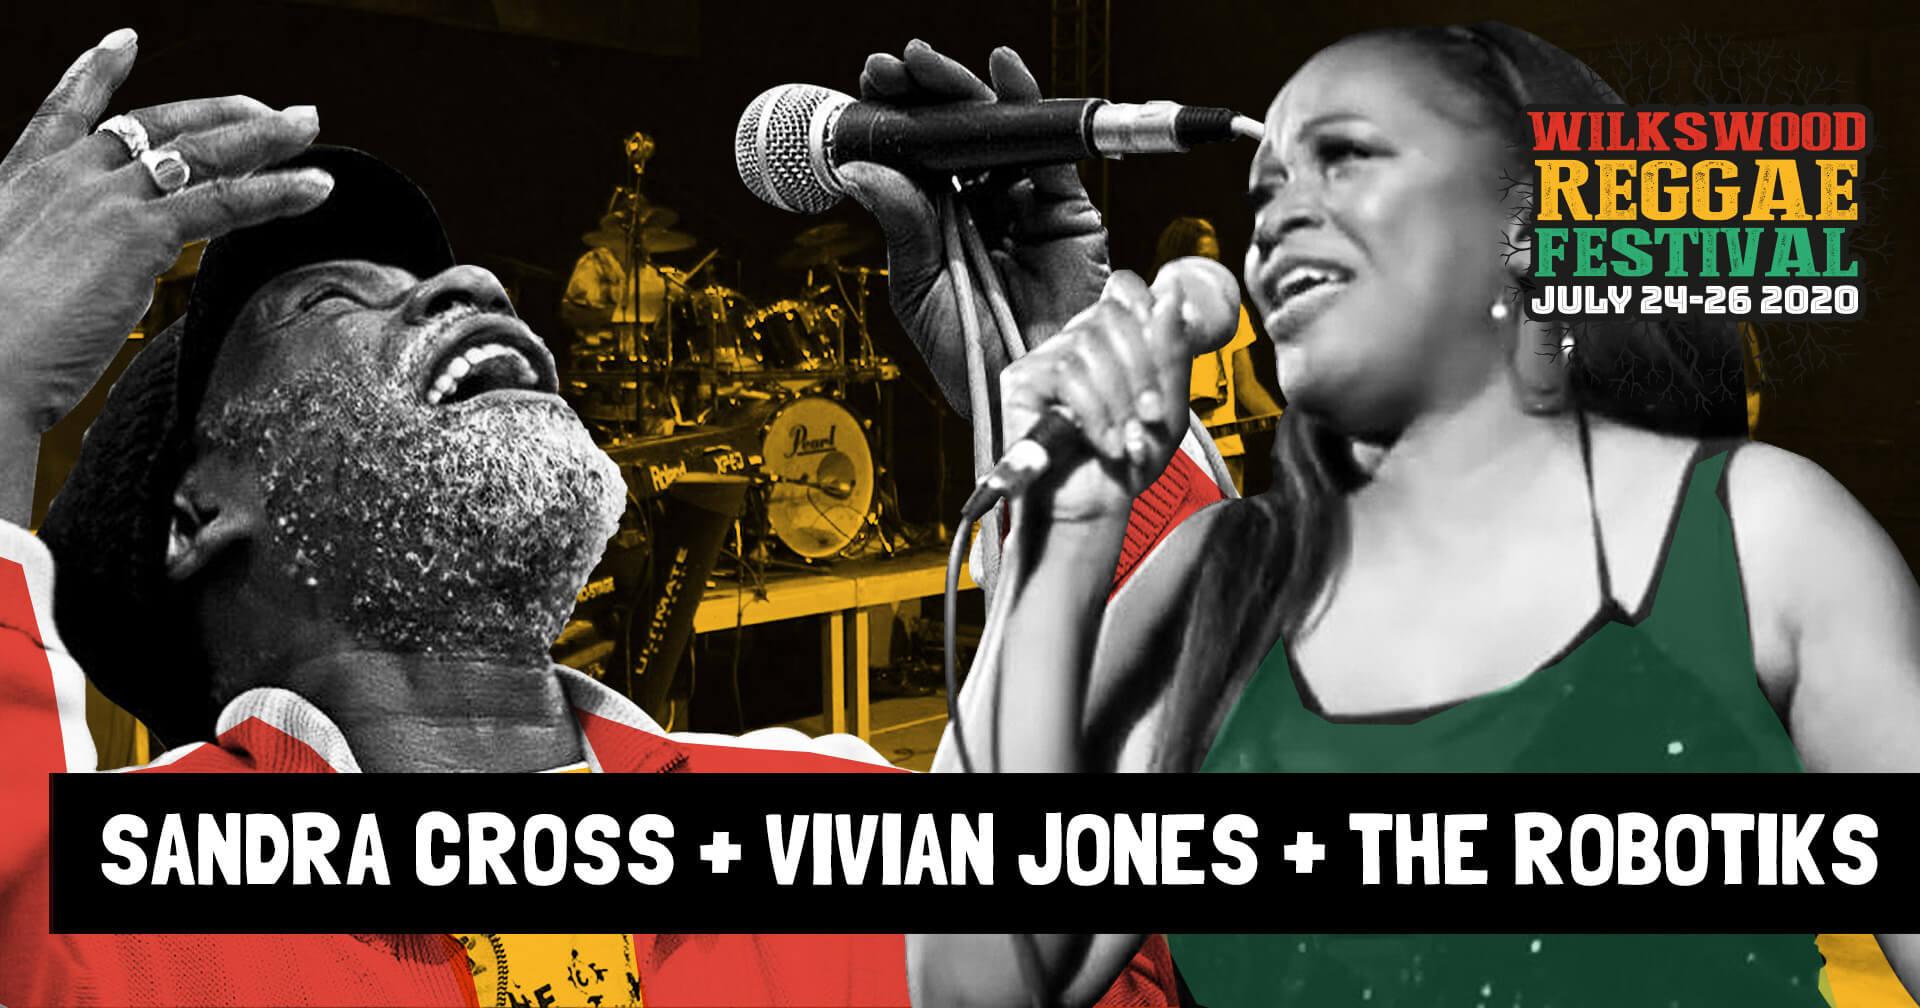 Wilkswood Roots Reggae 2020 | Sandra Cross + Vivian Jones + The Robotiks